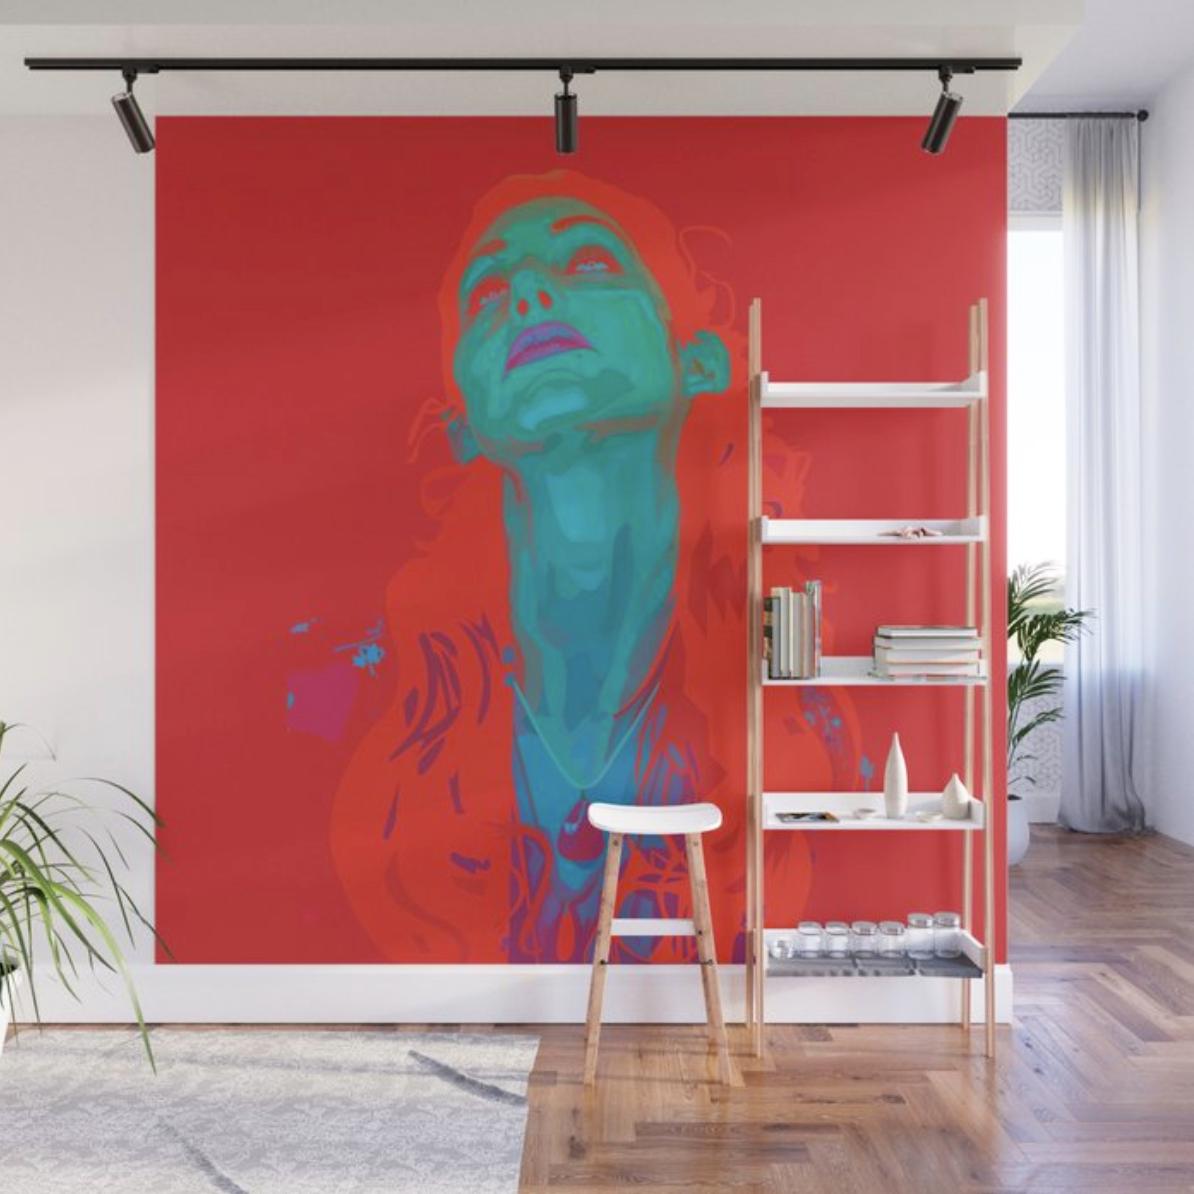 "Geena Matuson's (@geenamatuson) art ""I Sea Red"" printed on demand in her online shop @ thegirlmirage.com."